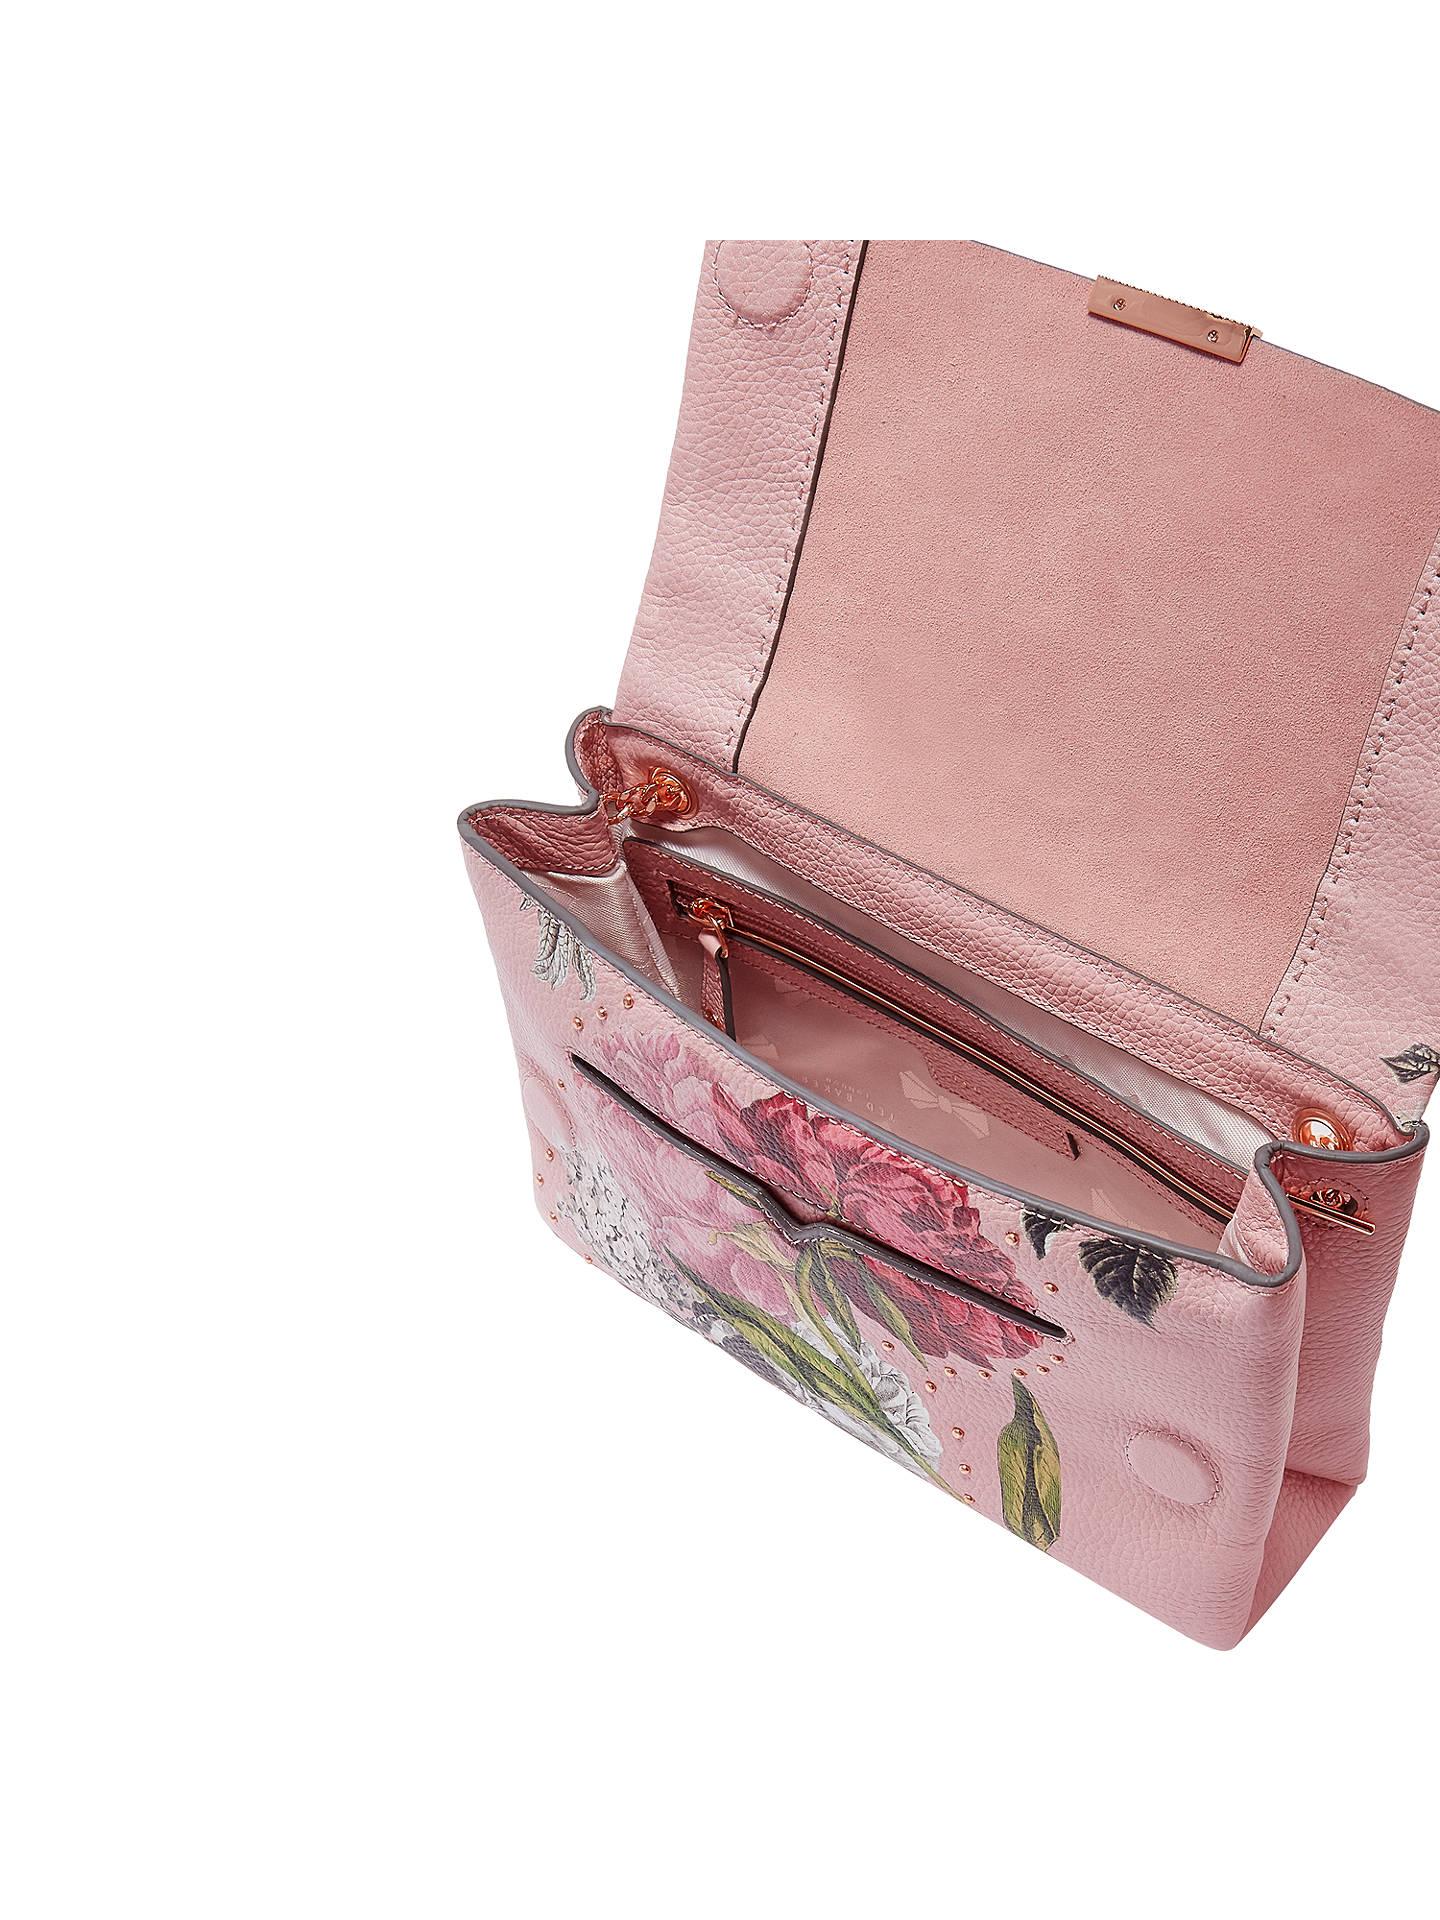 baf1fa2c932f ... Buy Ted Baker Ploomi Palace Gardens Leather Cross Body Bag